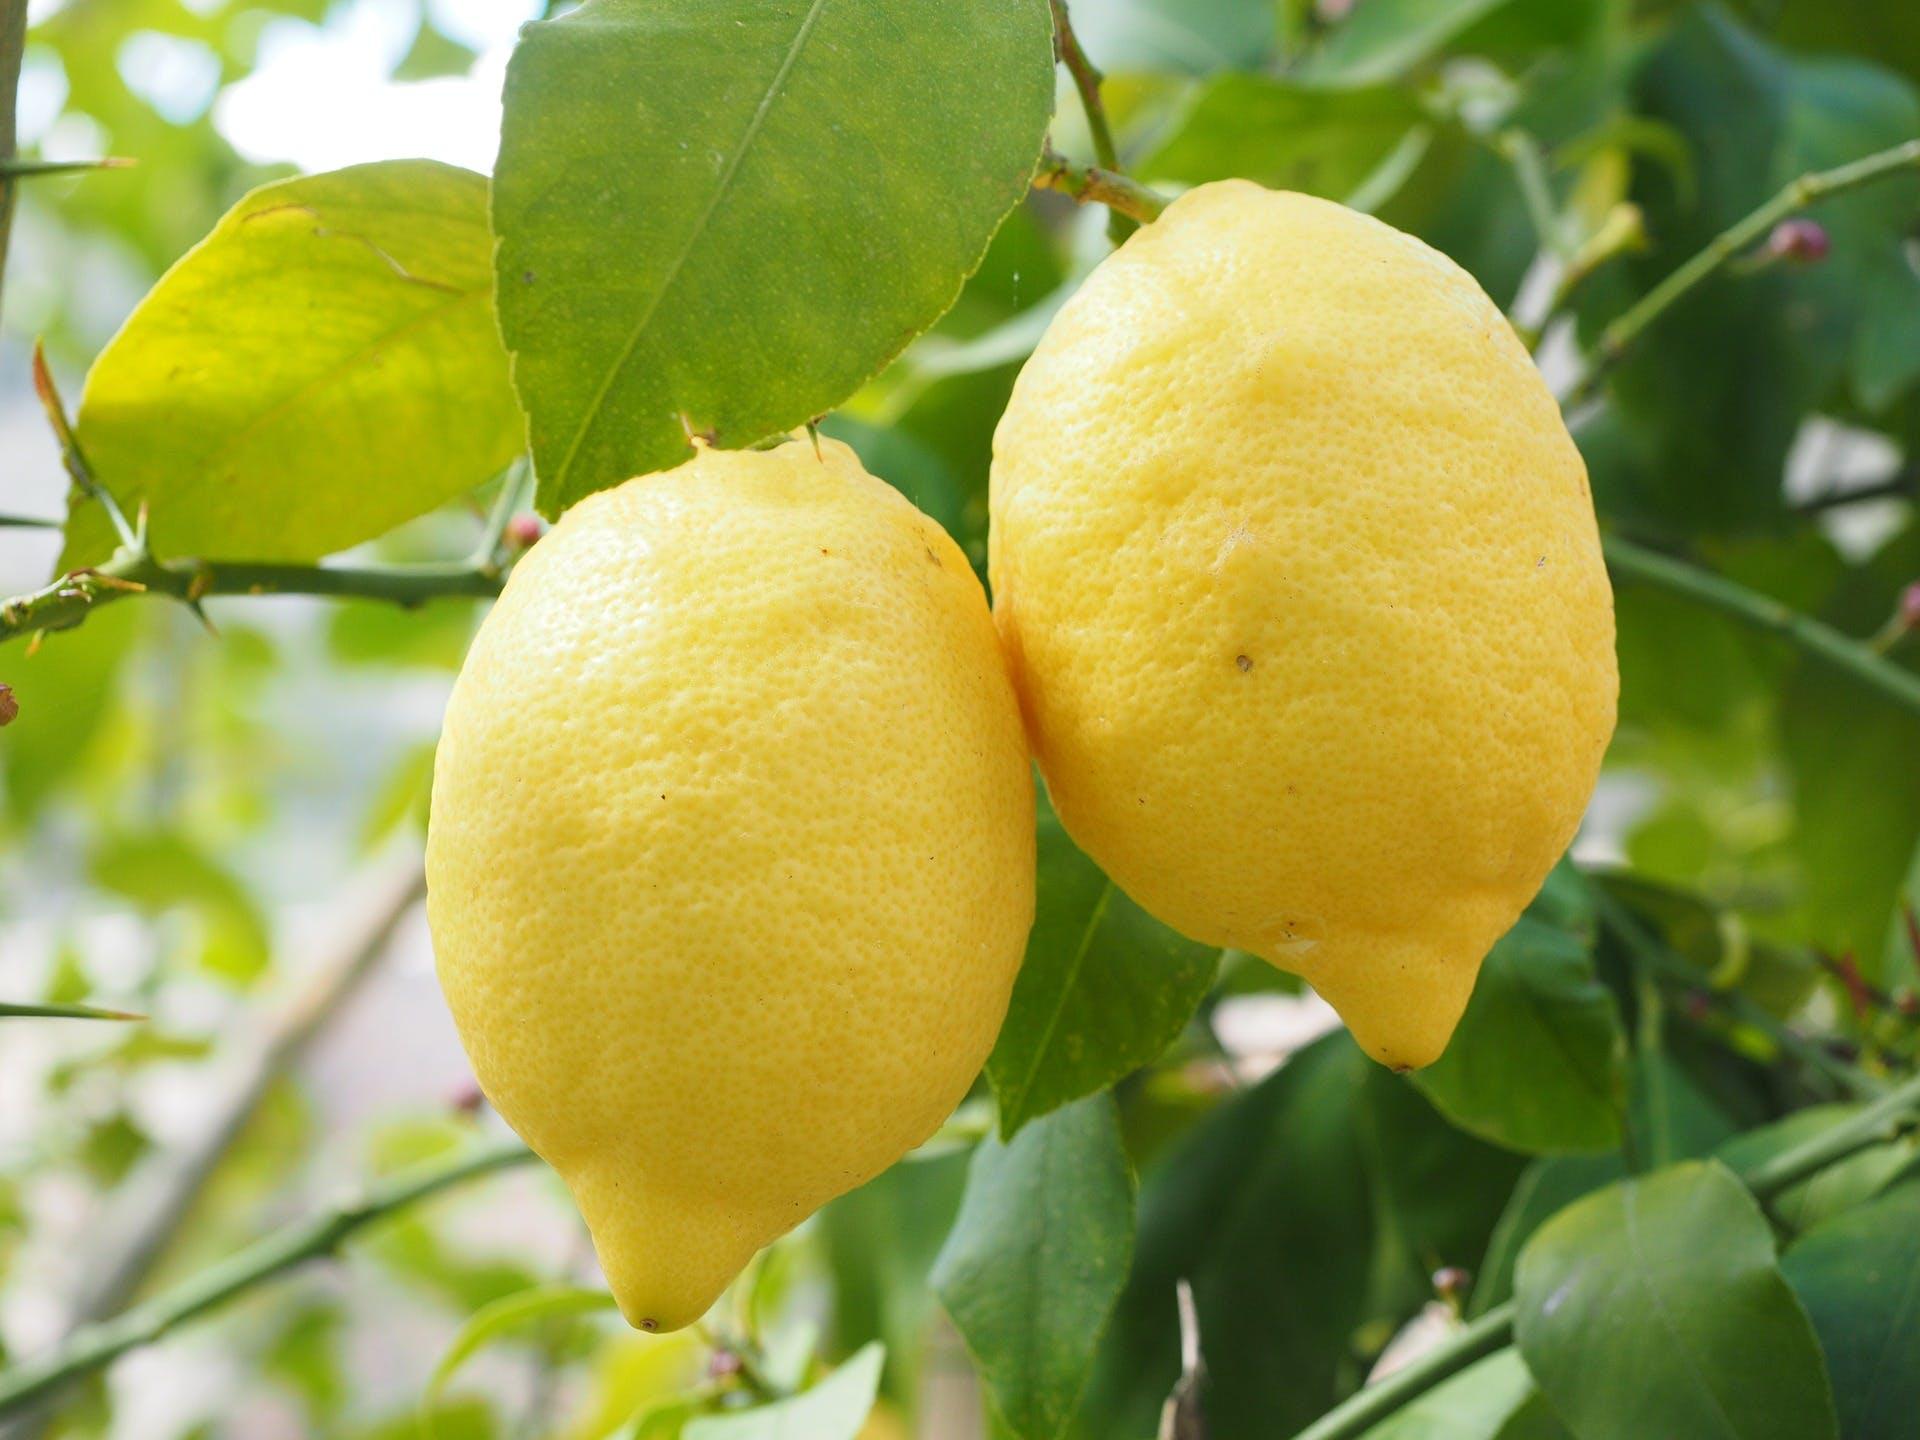 Lemon 1117568 1920